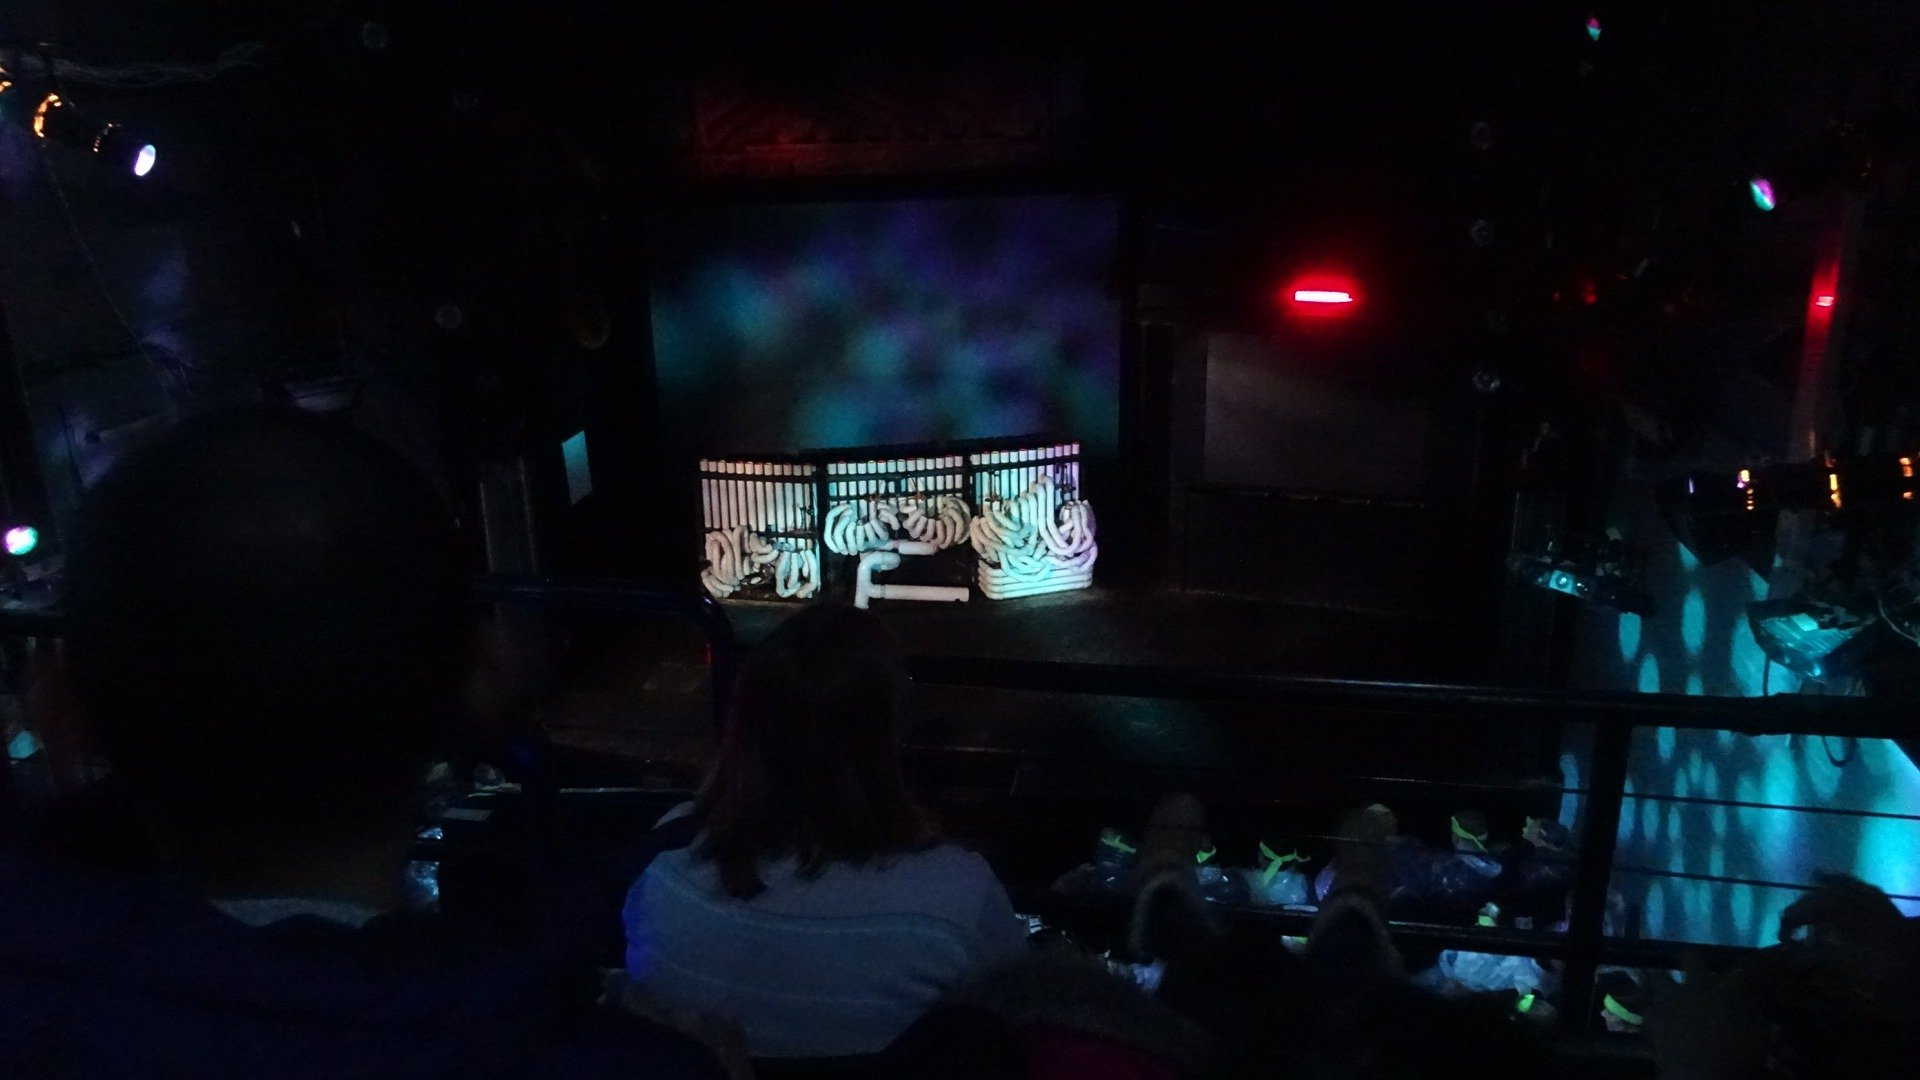 Astor Place Theatre Section Mezz Row C Seat 4